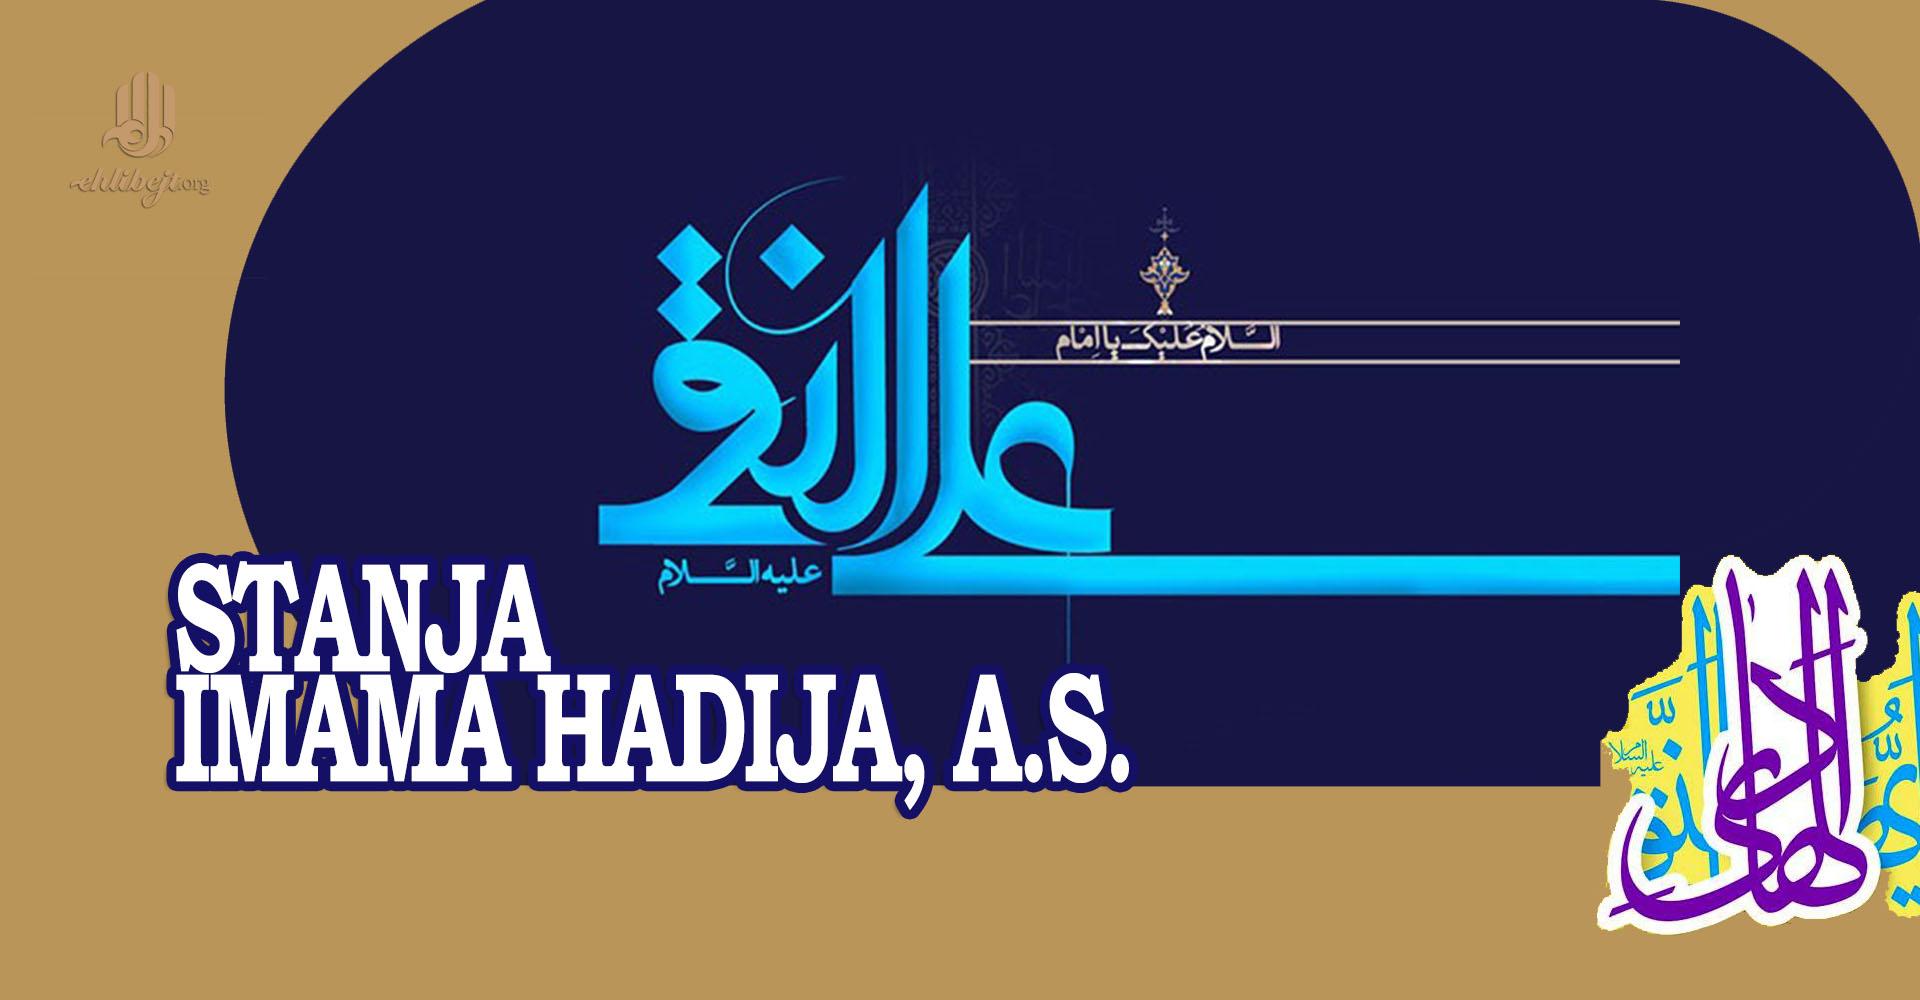 Stanja Imama Hadija, a.s.